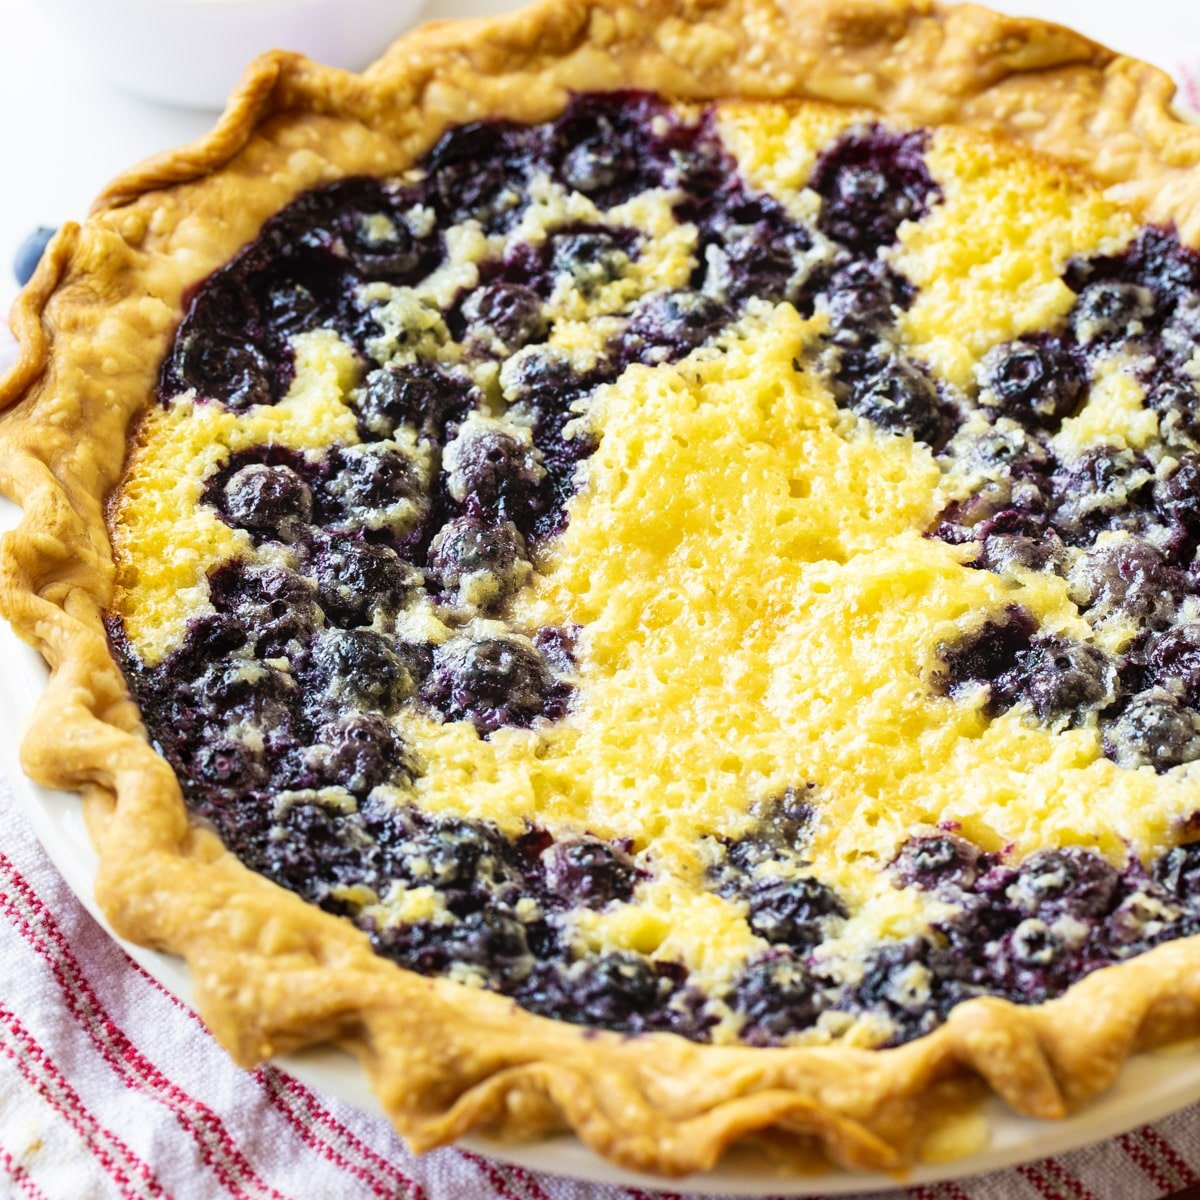 Whole Blueberry Buttermilk Pie